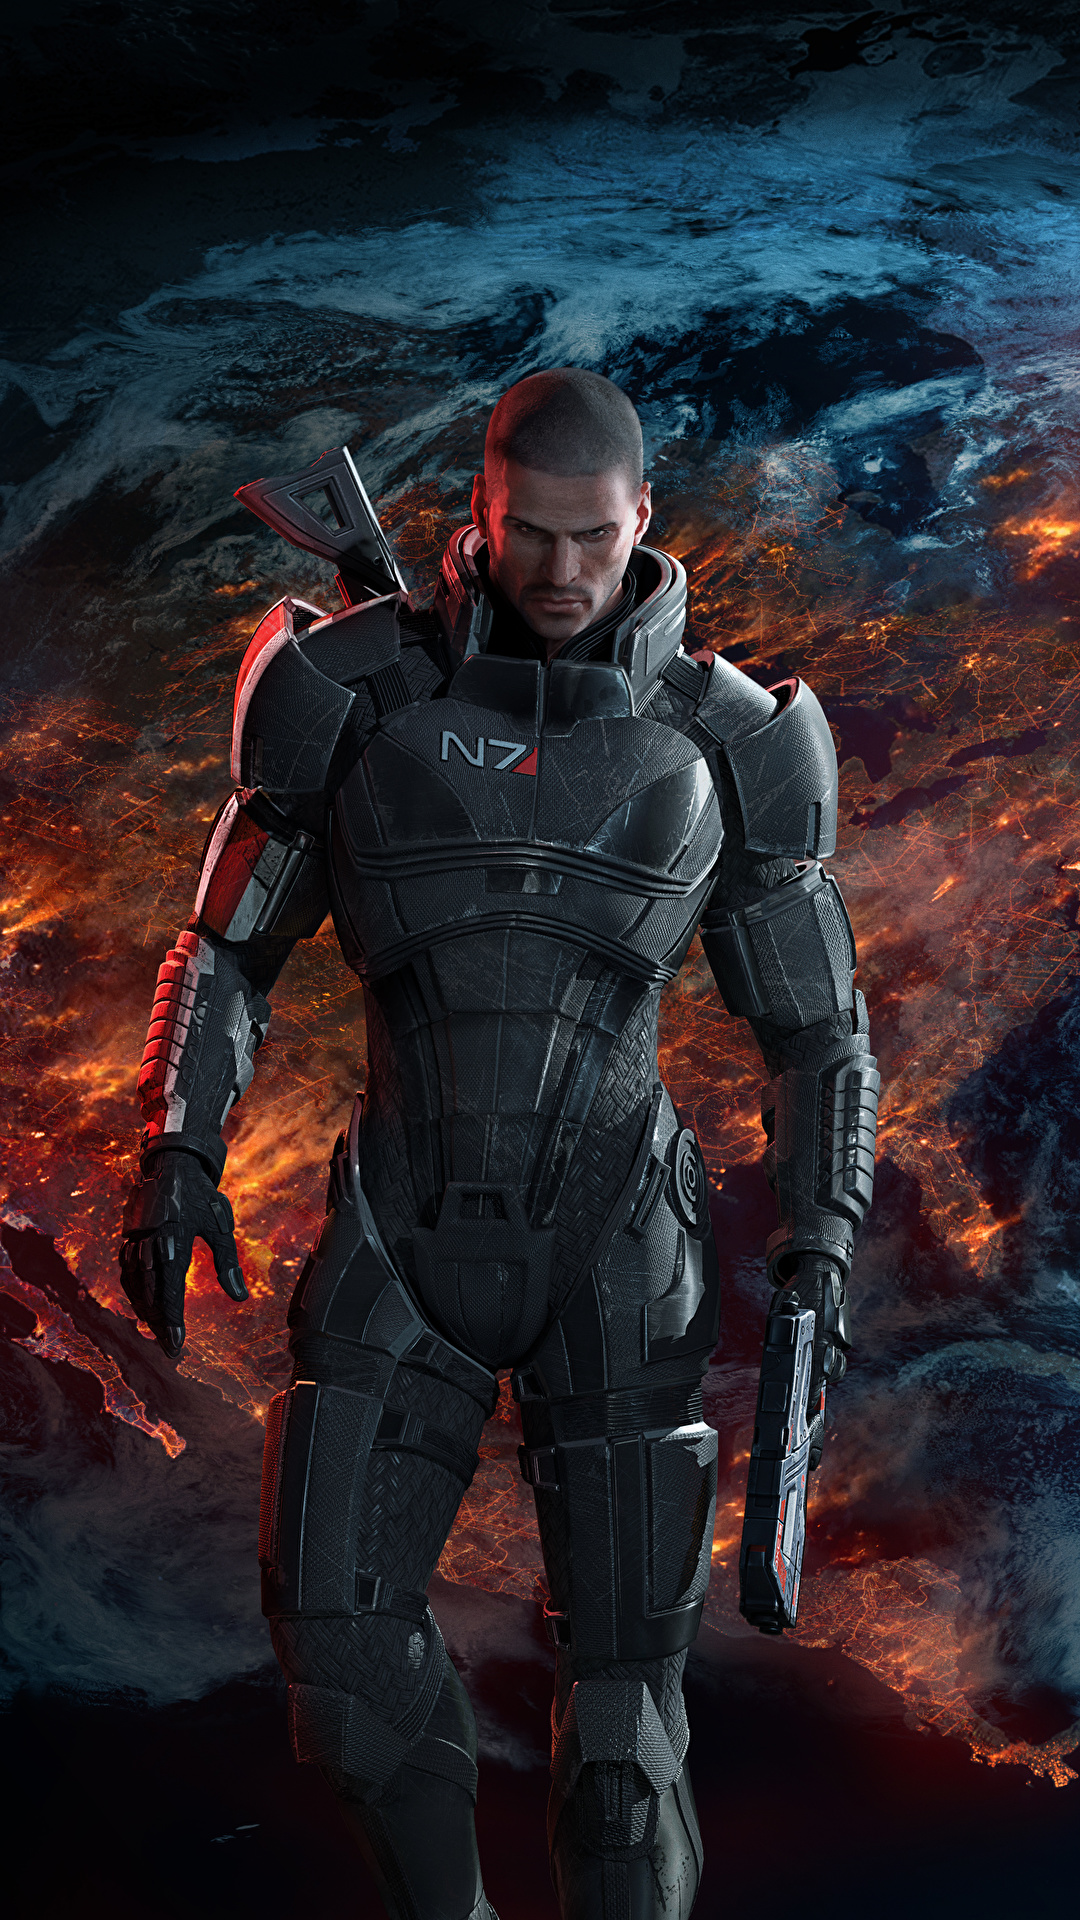 Image Shepard Mass Effect 3 Armor Pistols Man Fantasy Vdeo